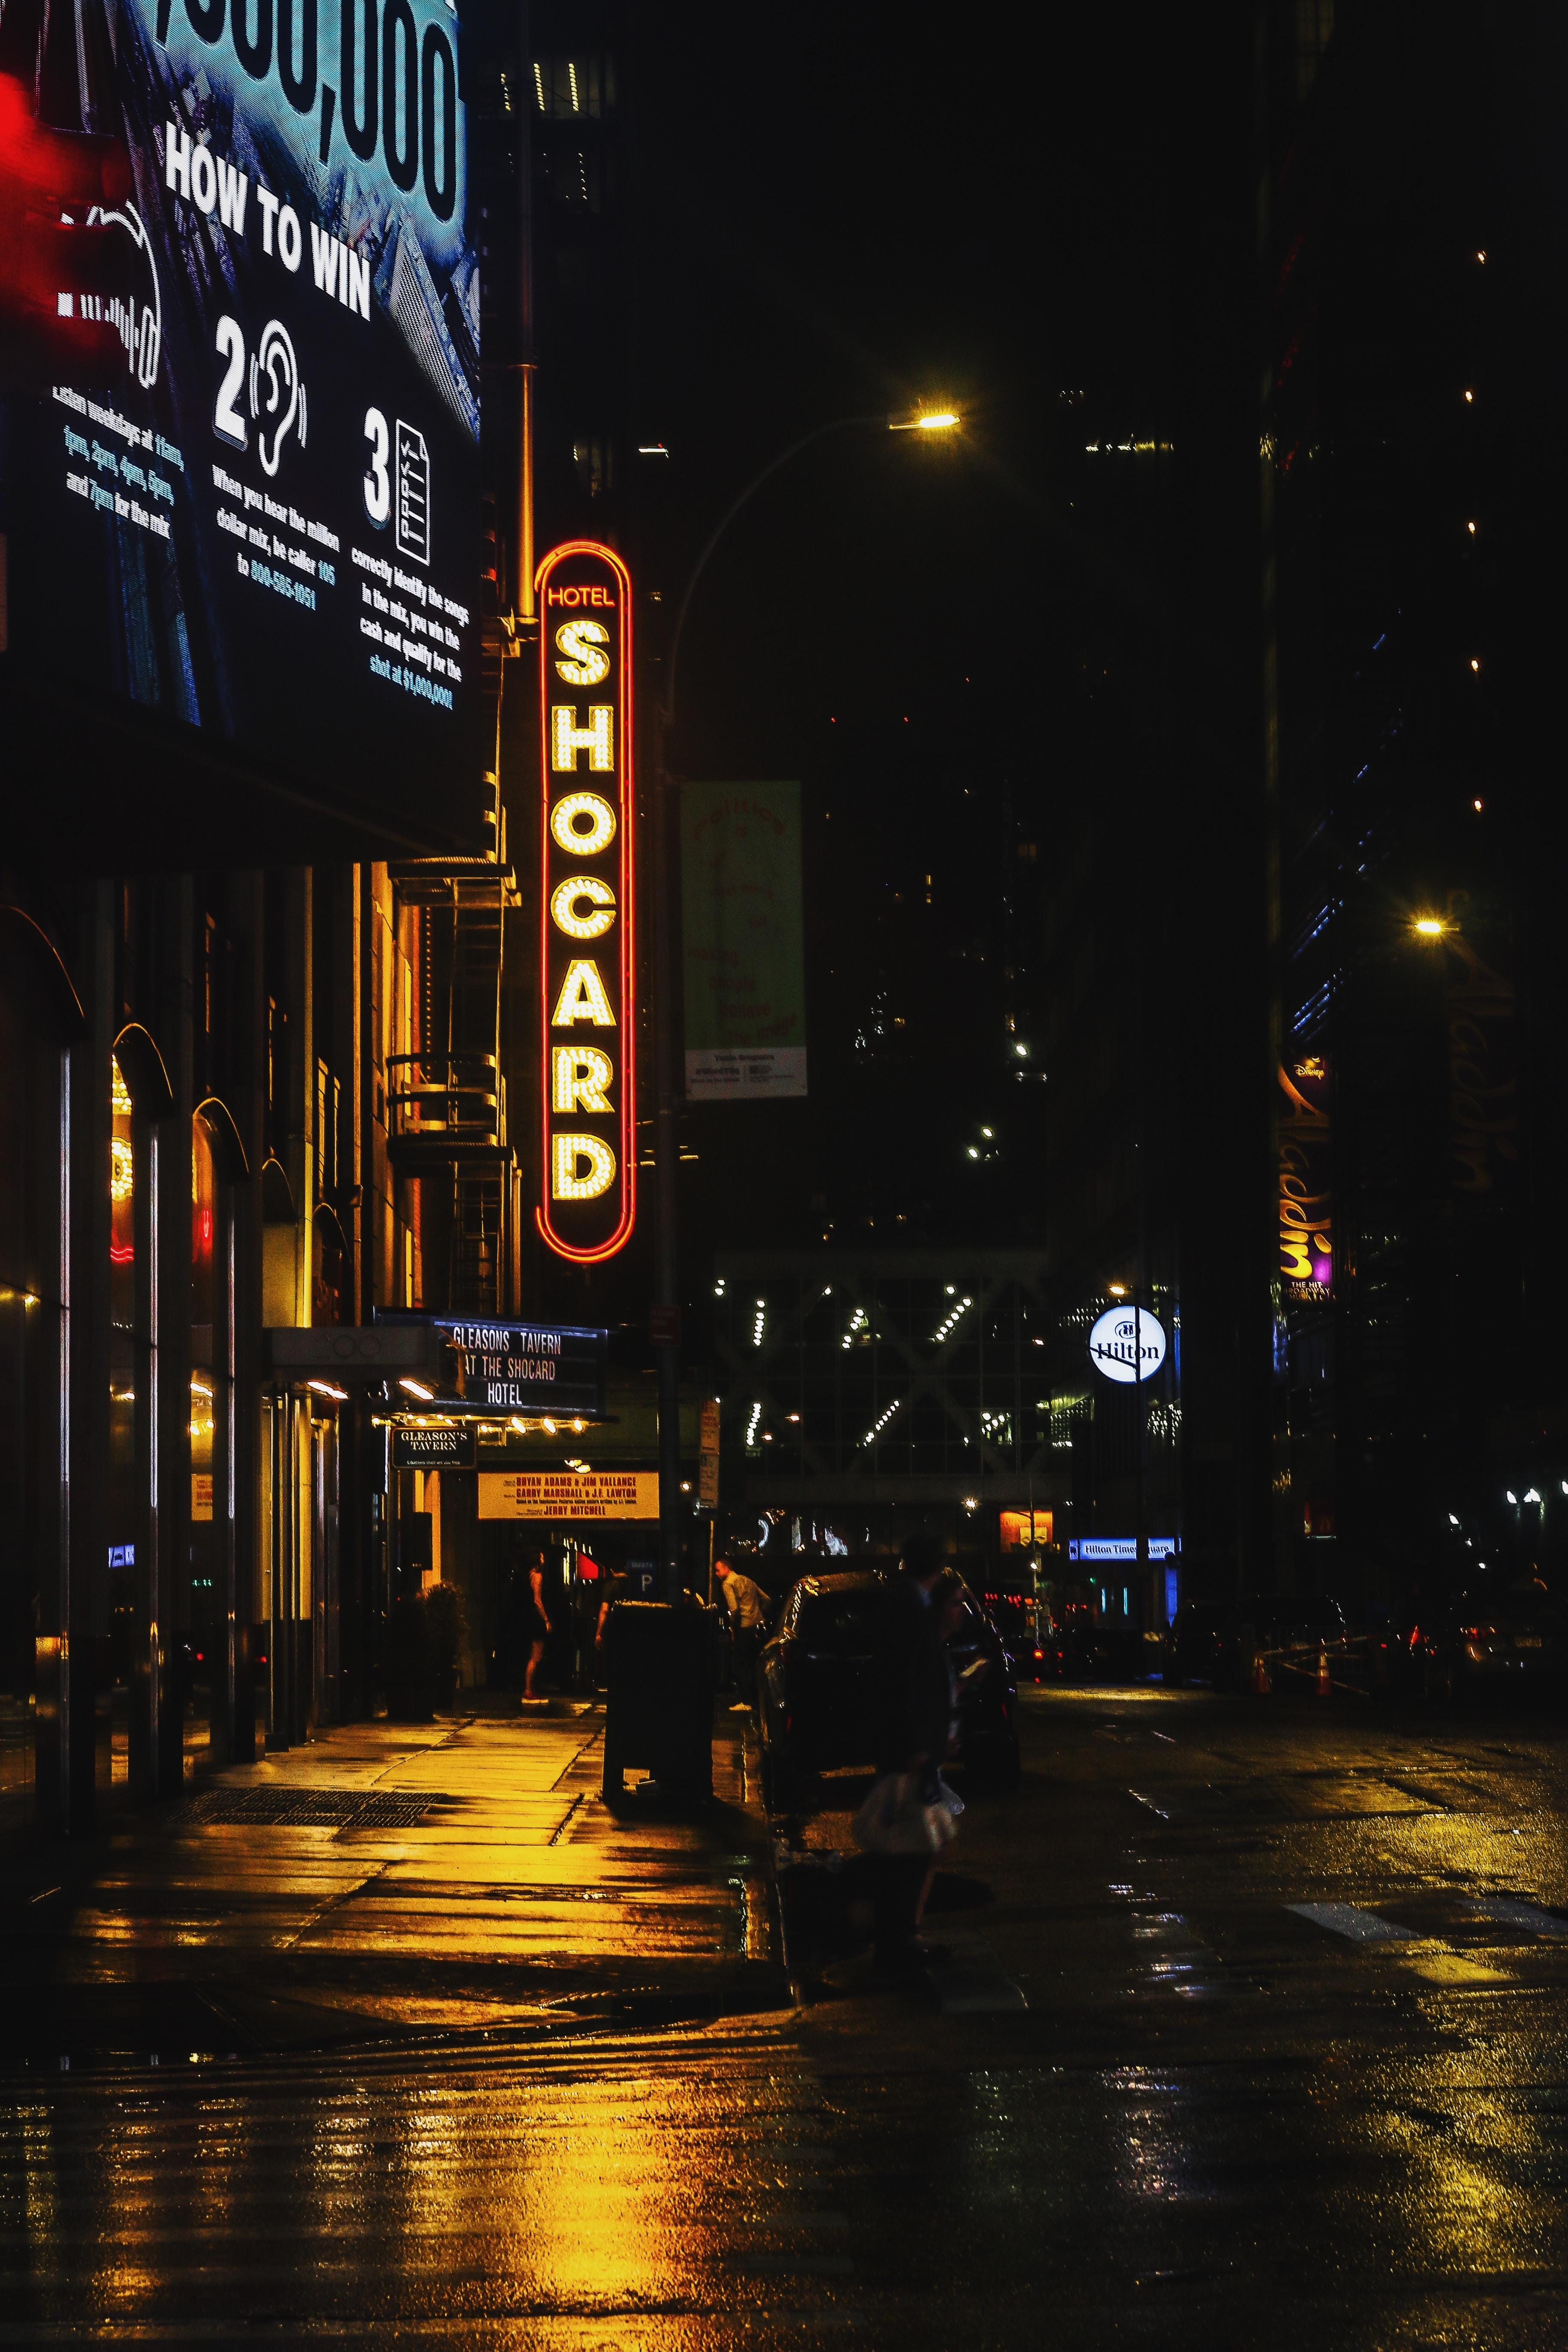 street Shocard signage at night